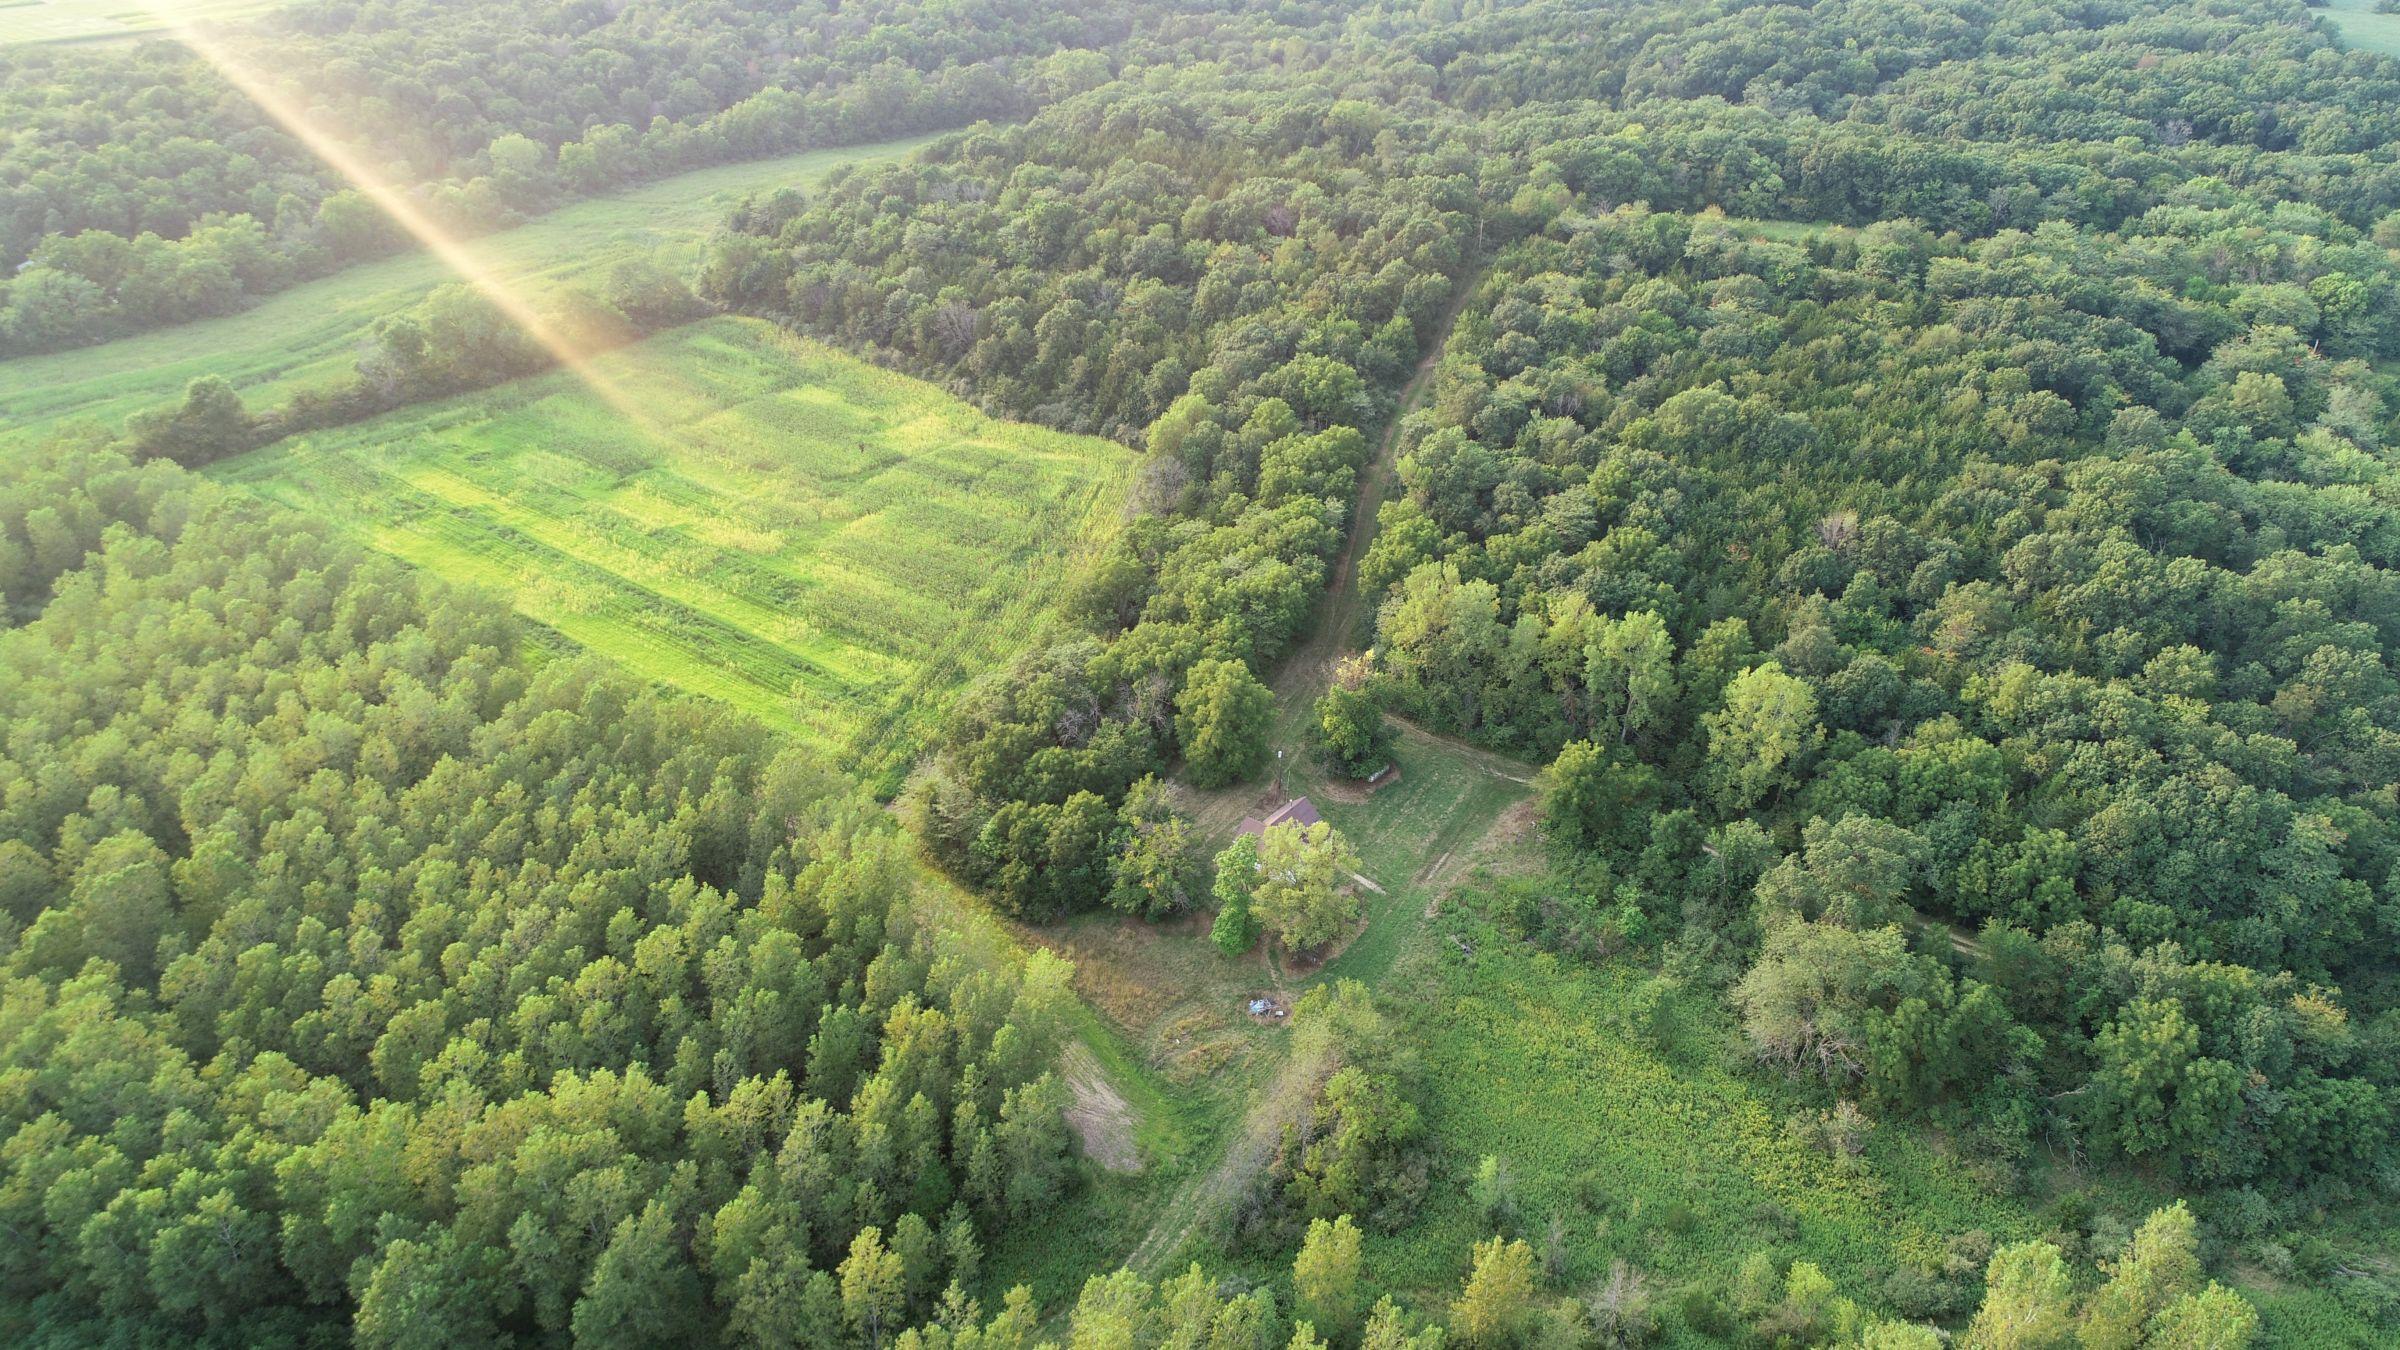 land-lee-county-iowa-328-acres-listing-number-15137-10-2020-08-27-175041.jpg